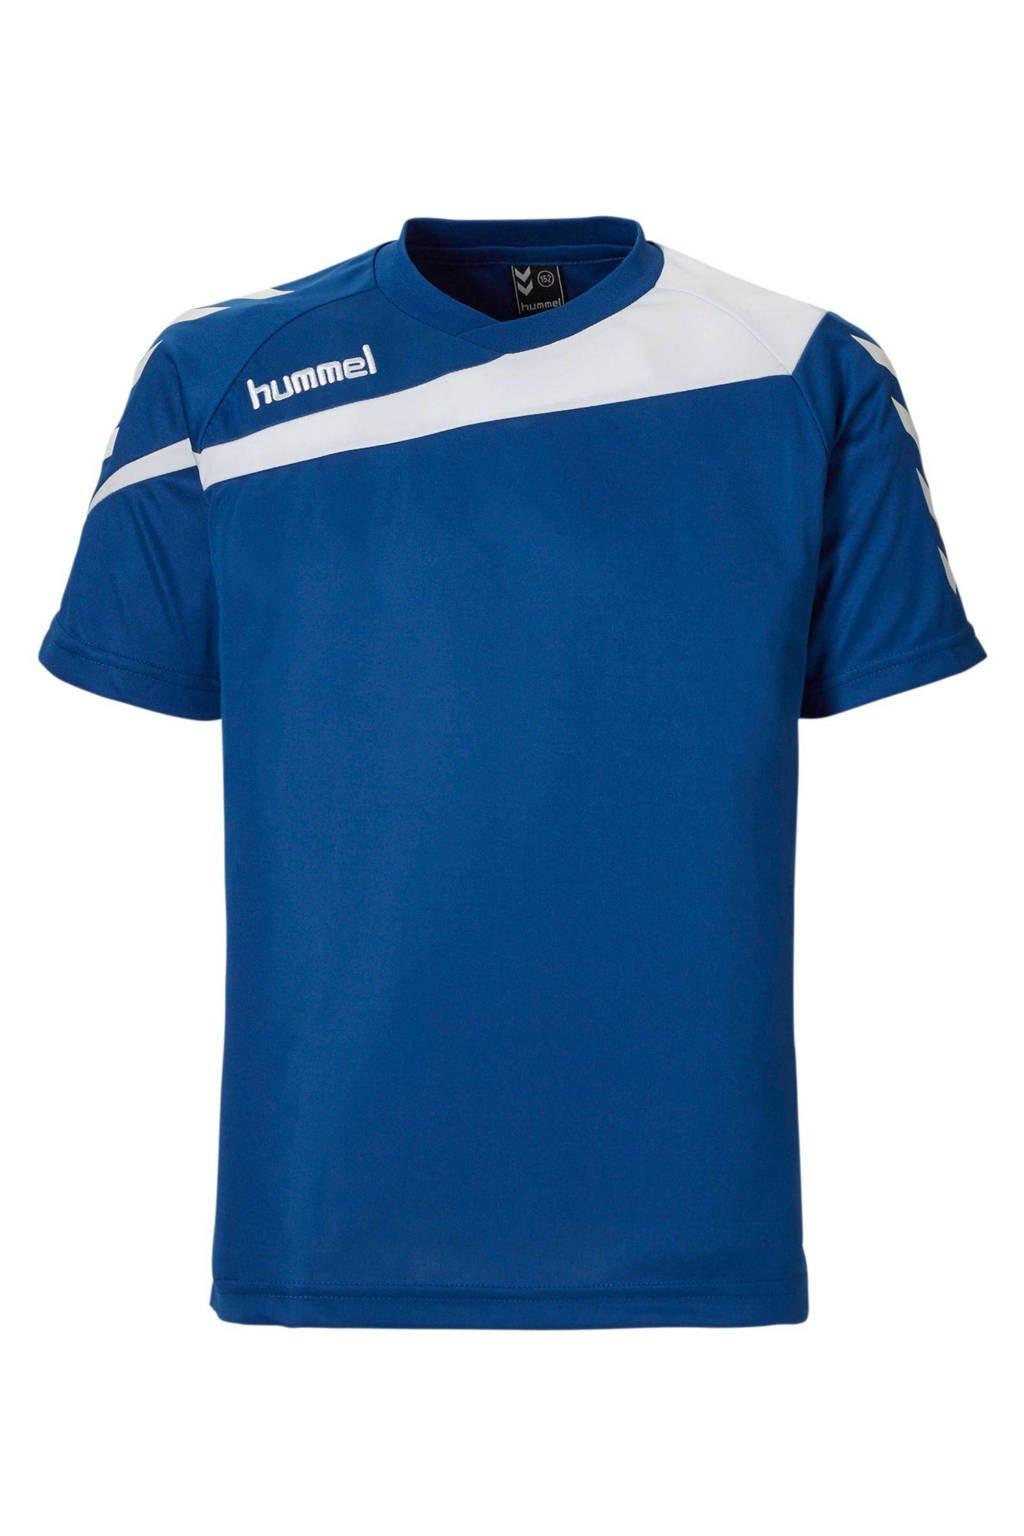 hummel Junior  sport T-shirt, Blauw/wit, Jongens/meisjes